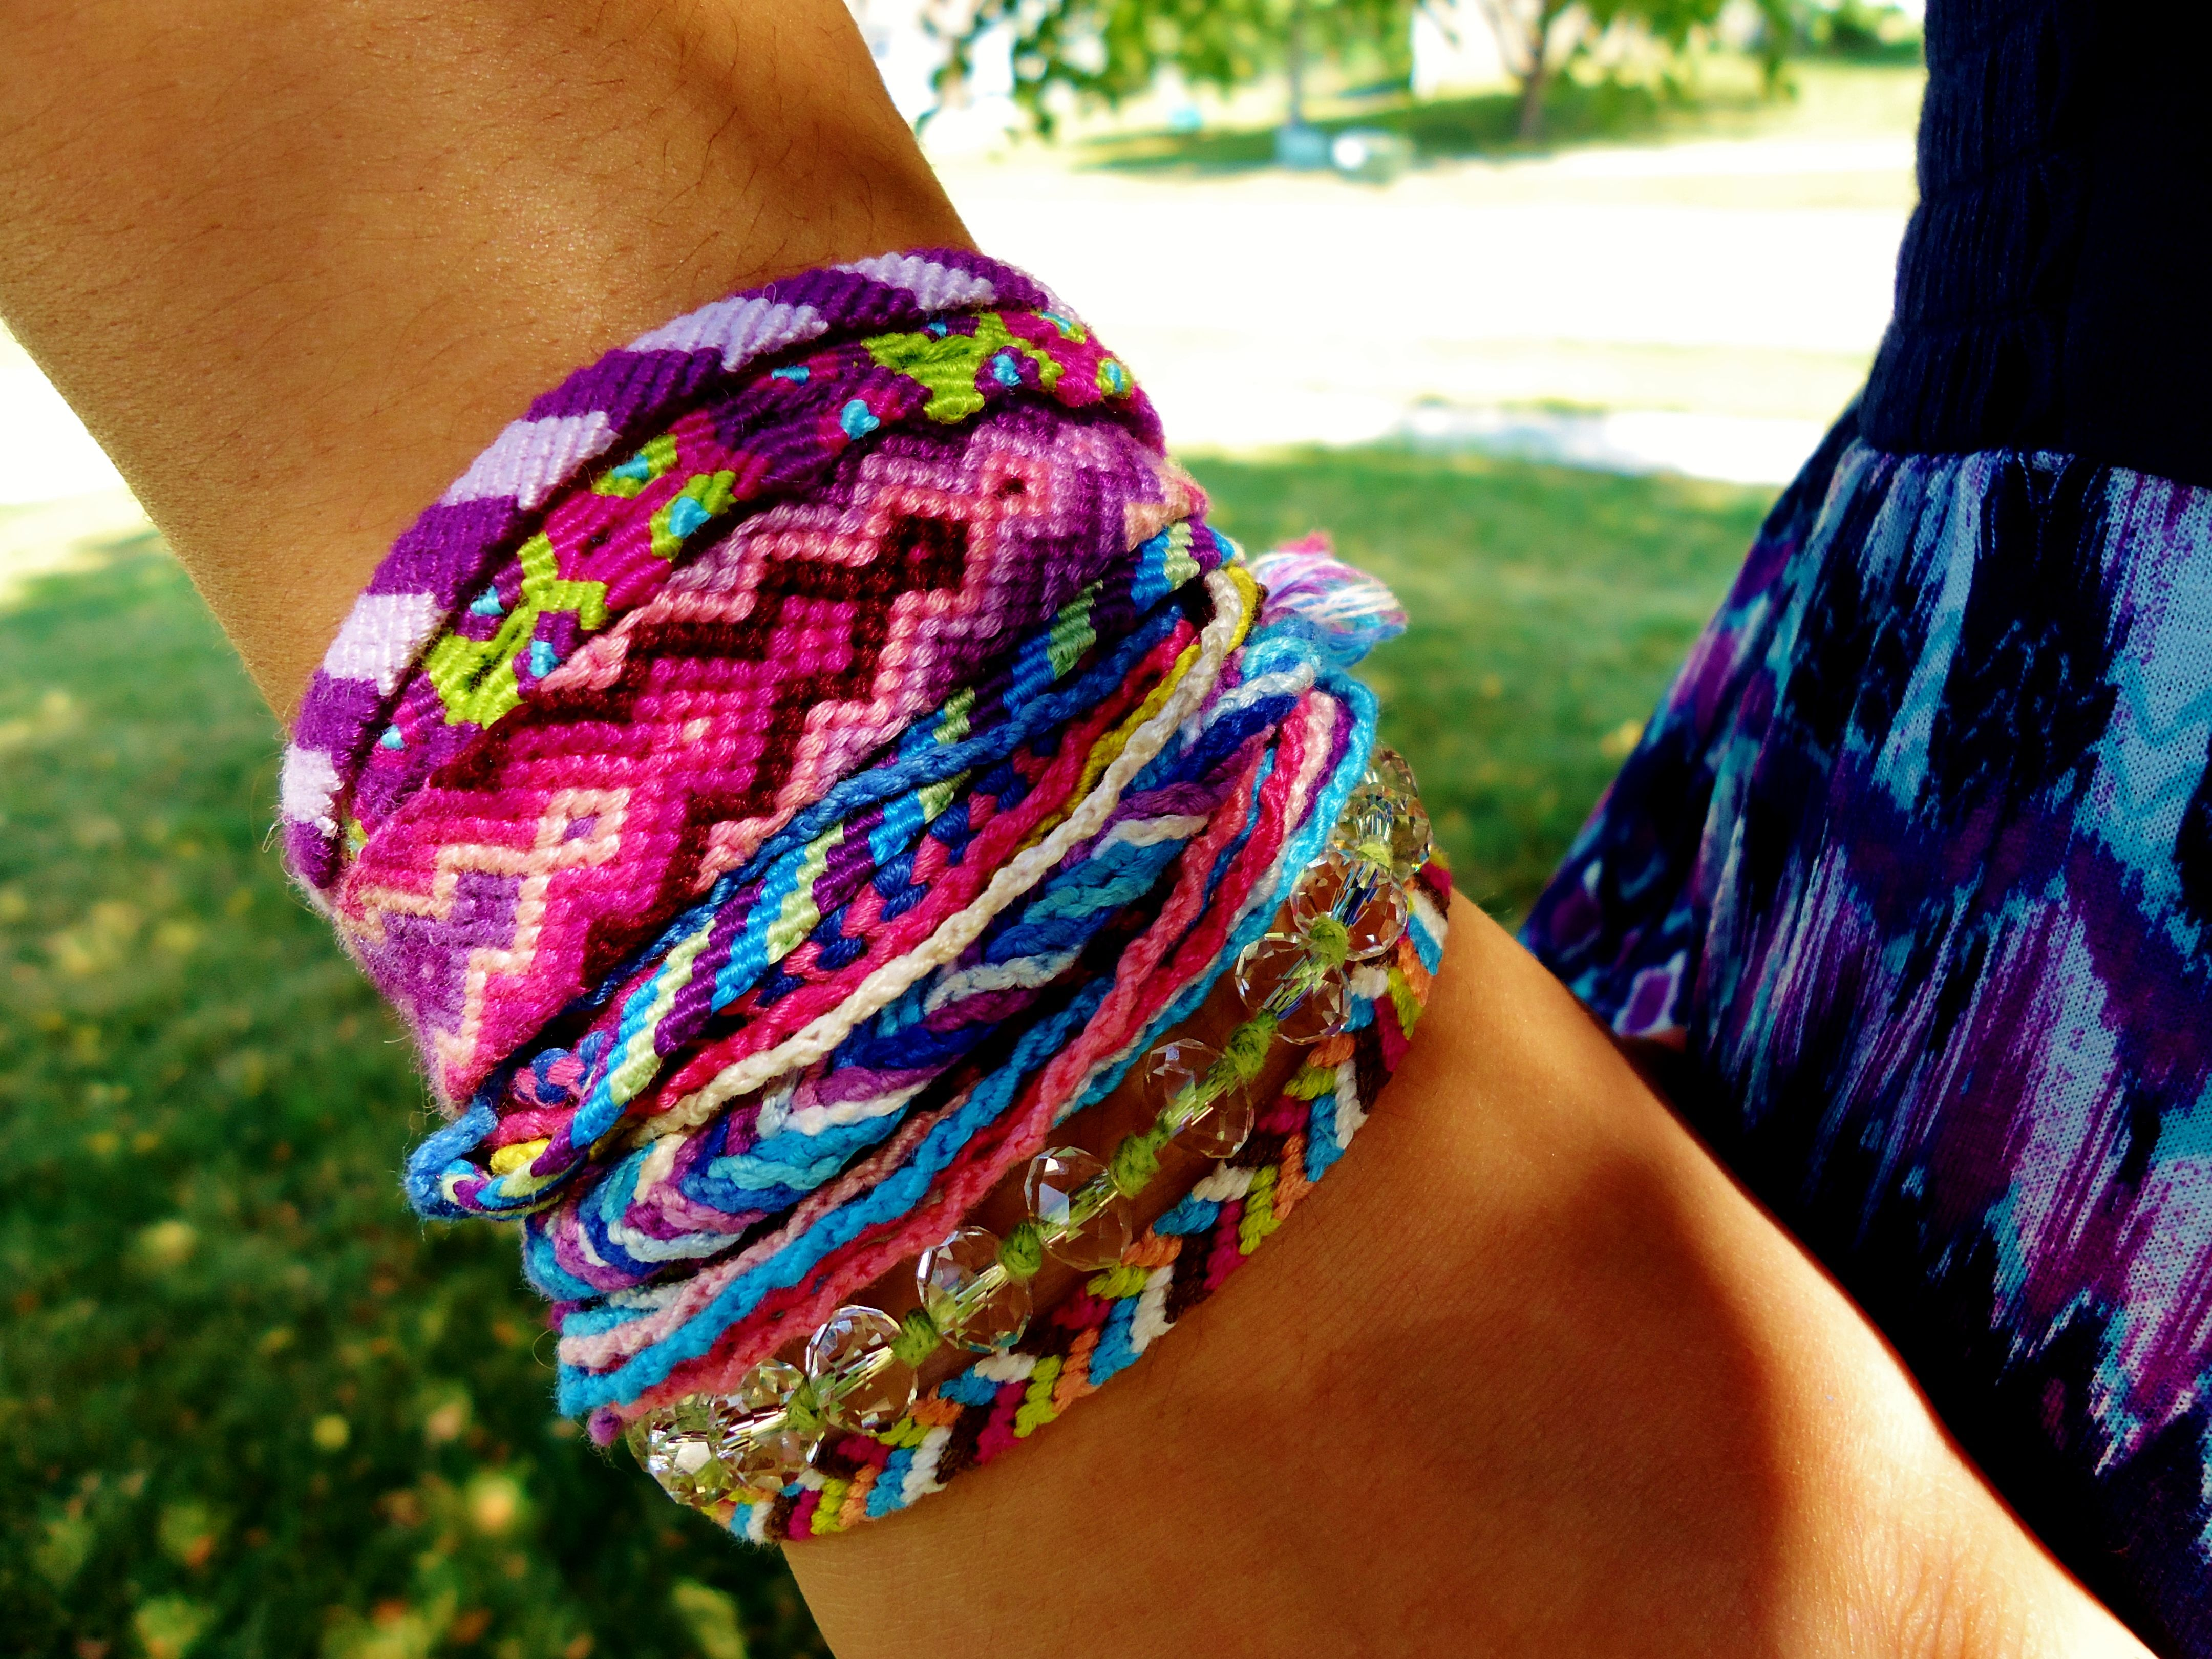 Bracelets friendship on wrist forecast to wear for spring in 2019